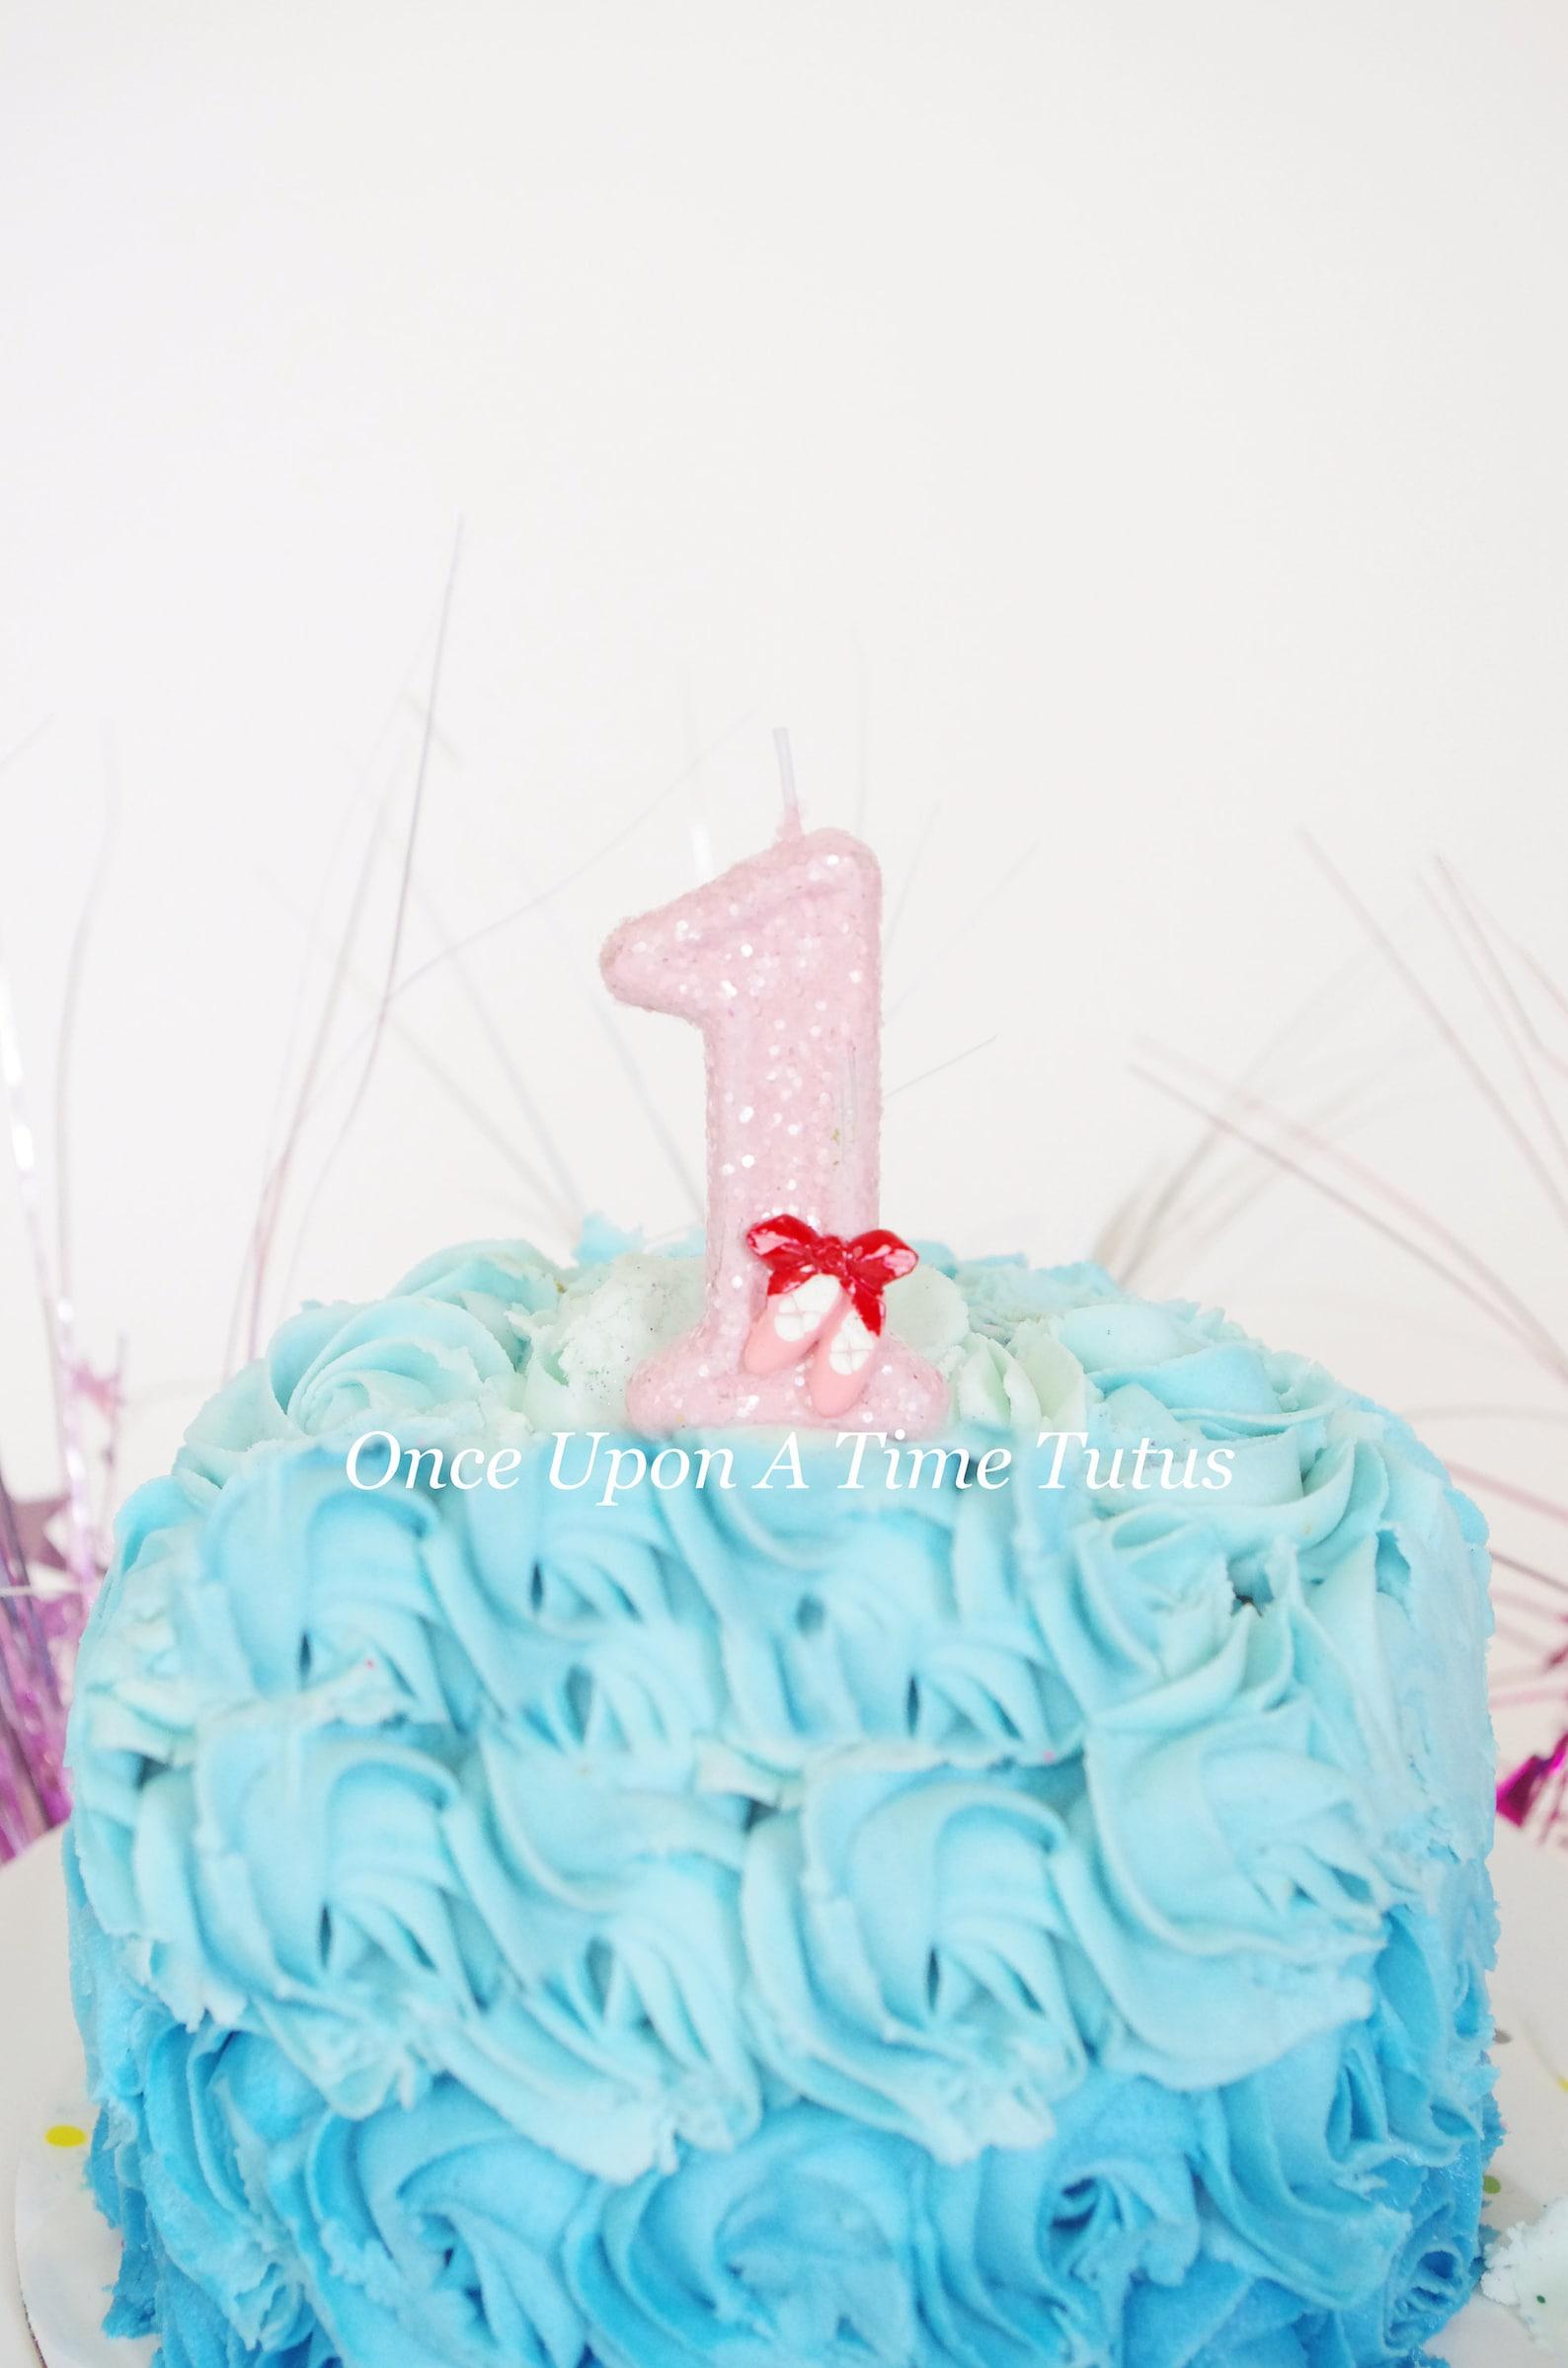 pink ballet glitter birthday candle - ballerina dancer party decor supplies photo prop sparkly sparkle cake topper keepsake stan